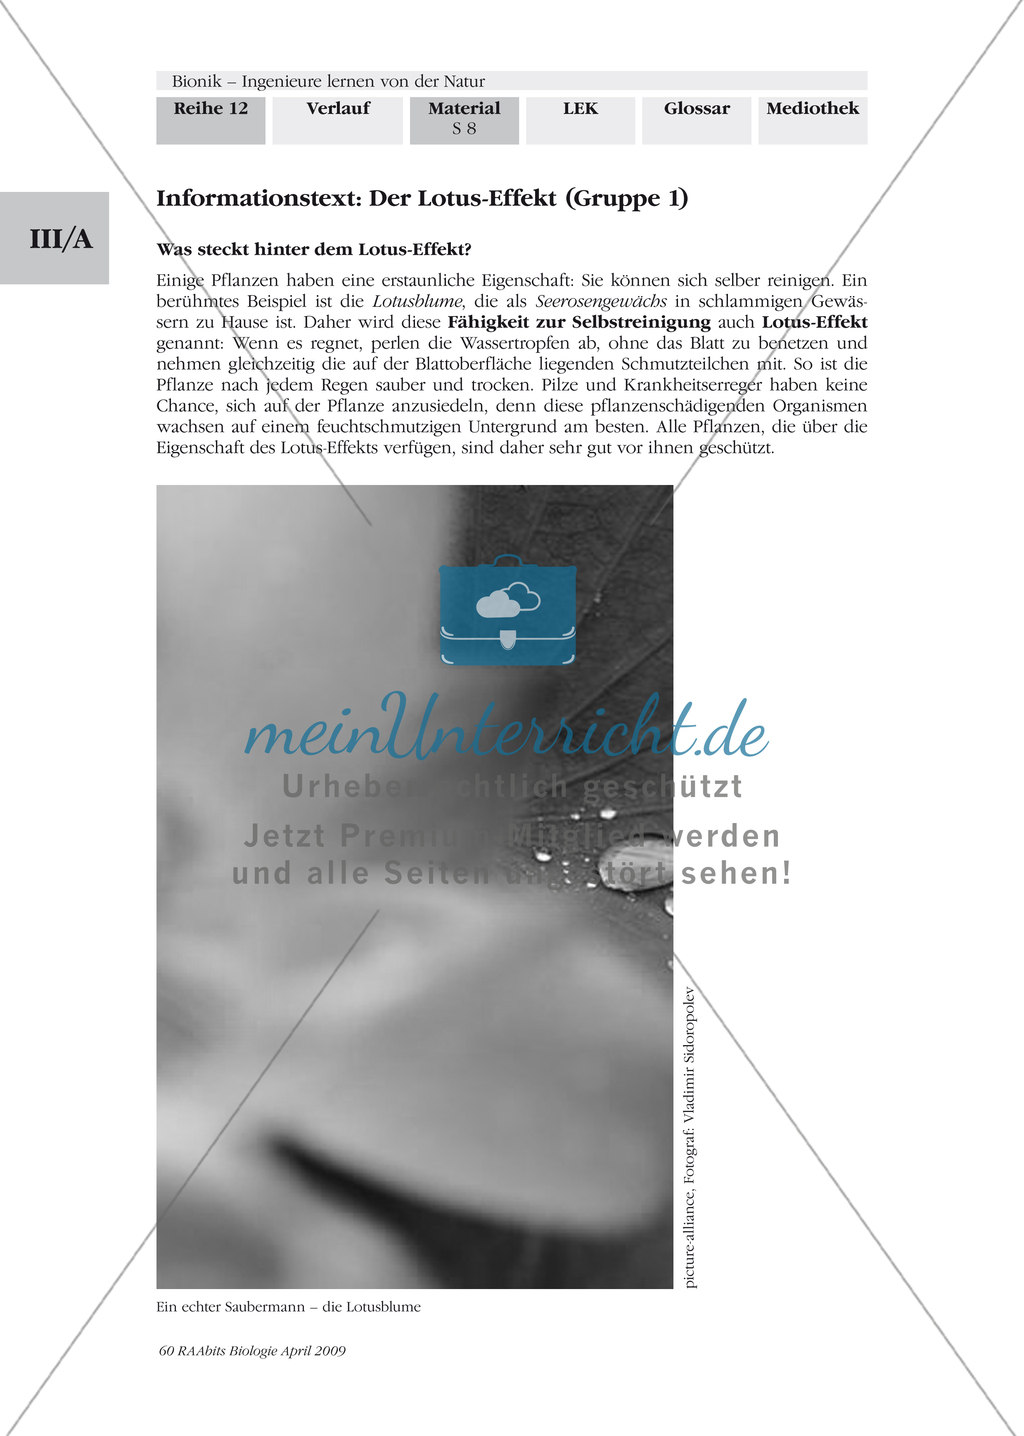 Bionik: Der Lotus-Effekt - Wandplakat Preview 1